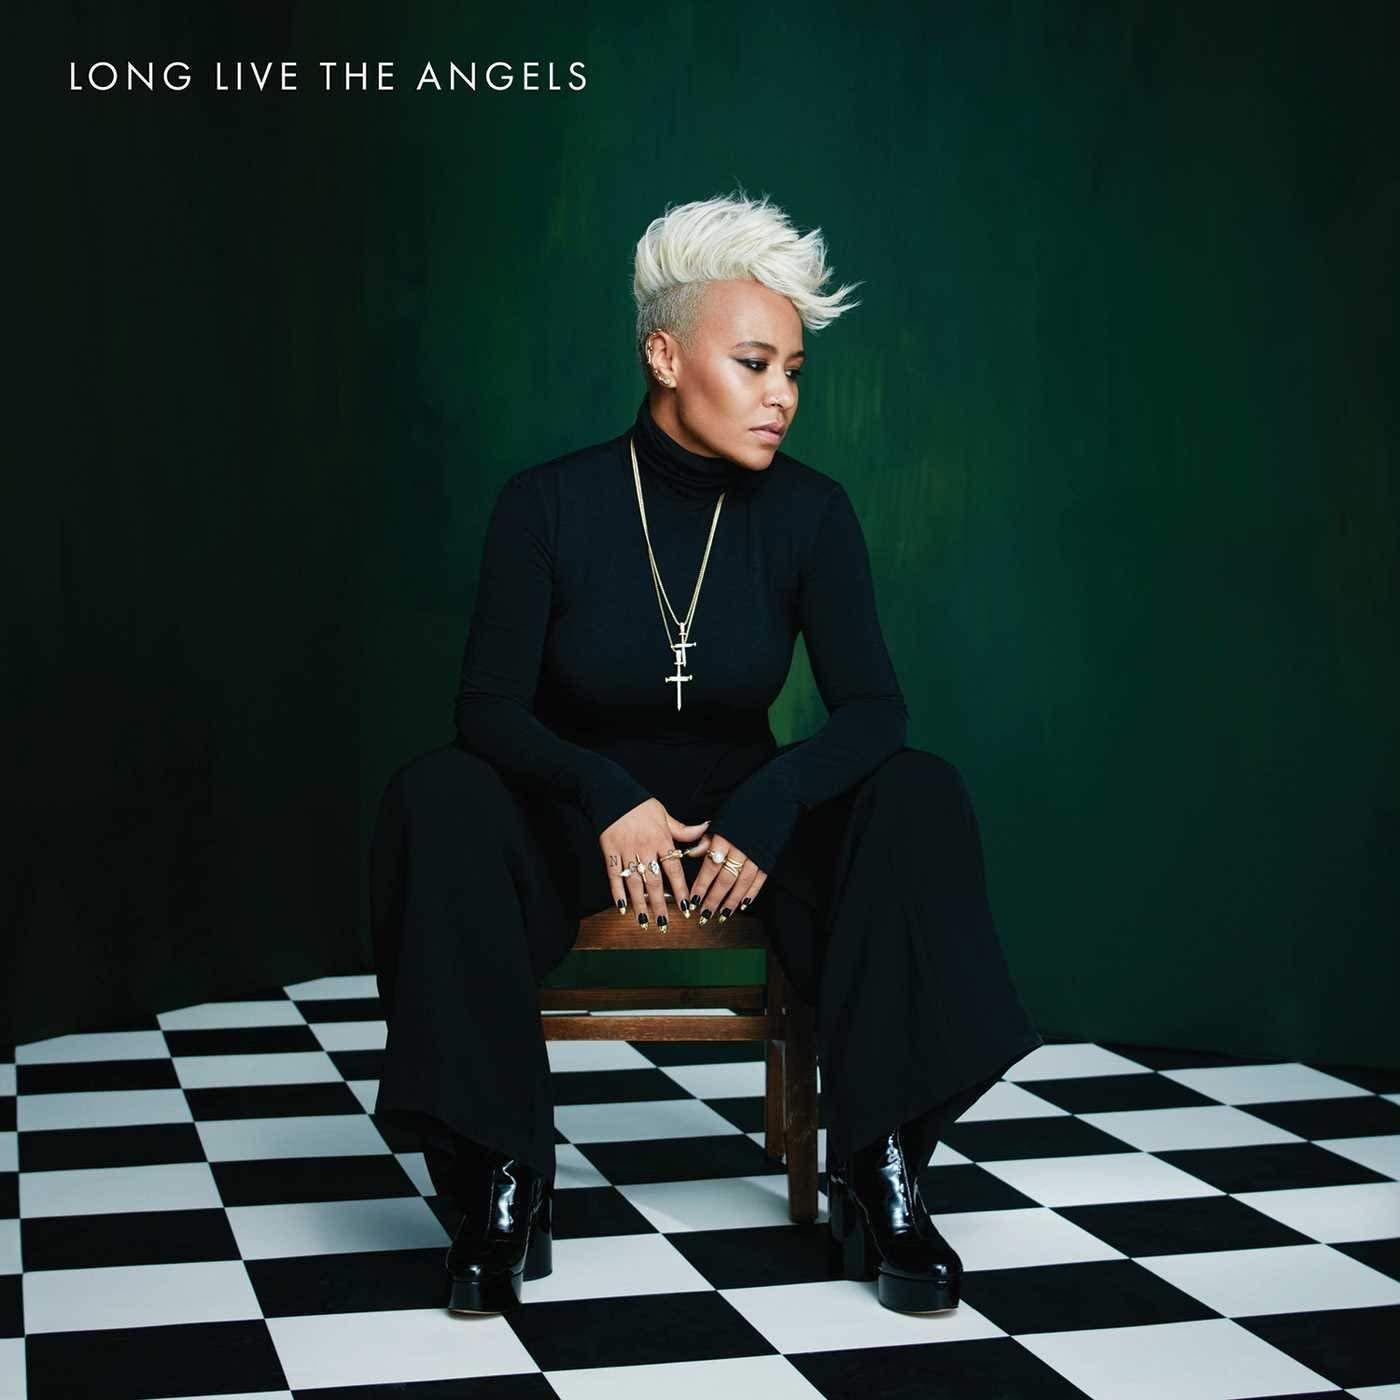 Emeli Sande - Long Live The Angels [VINYL] £10.87 (Non-Prime P&P +£4.49) @Amazon